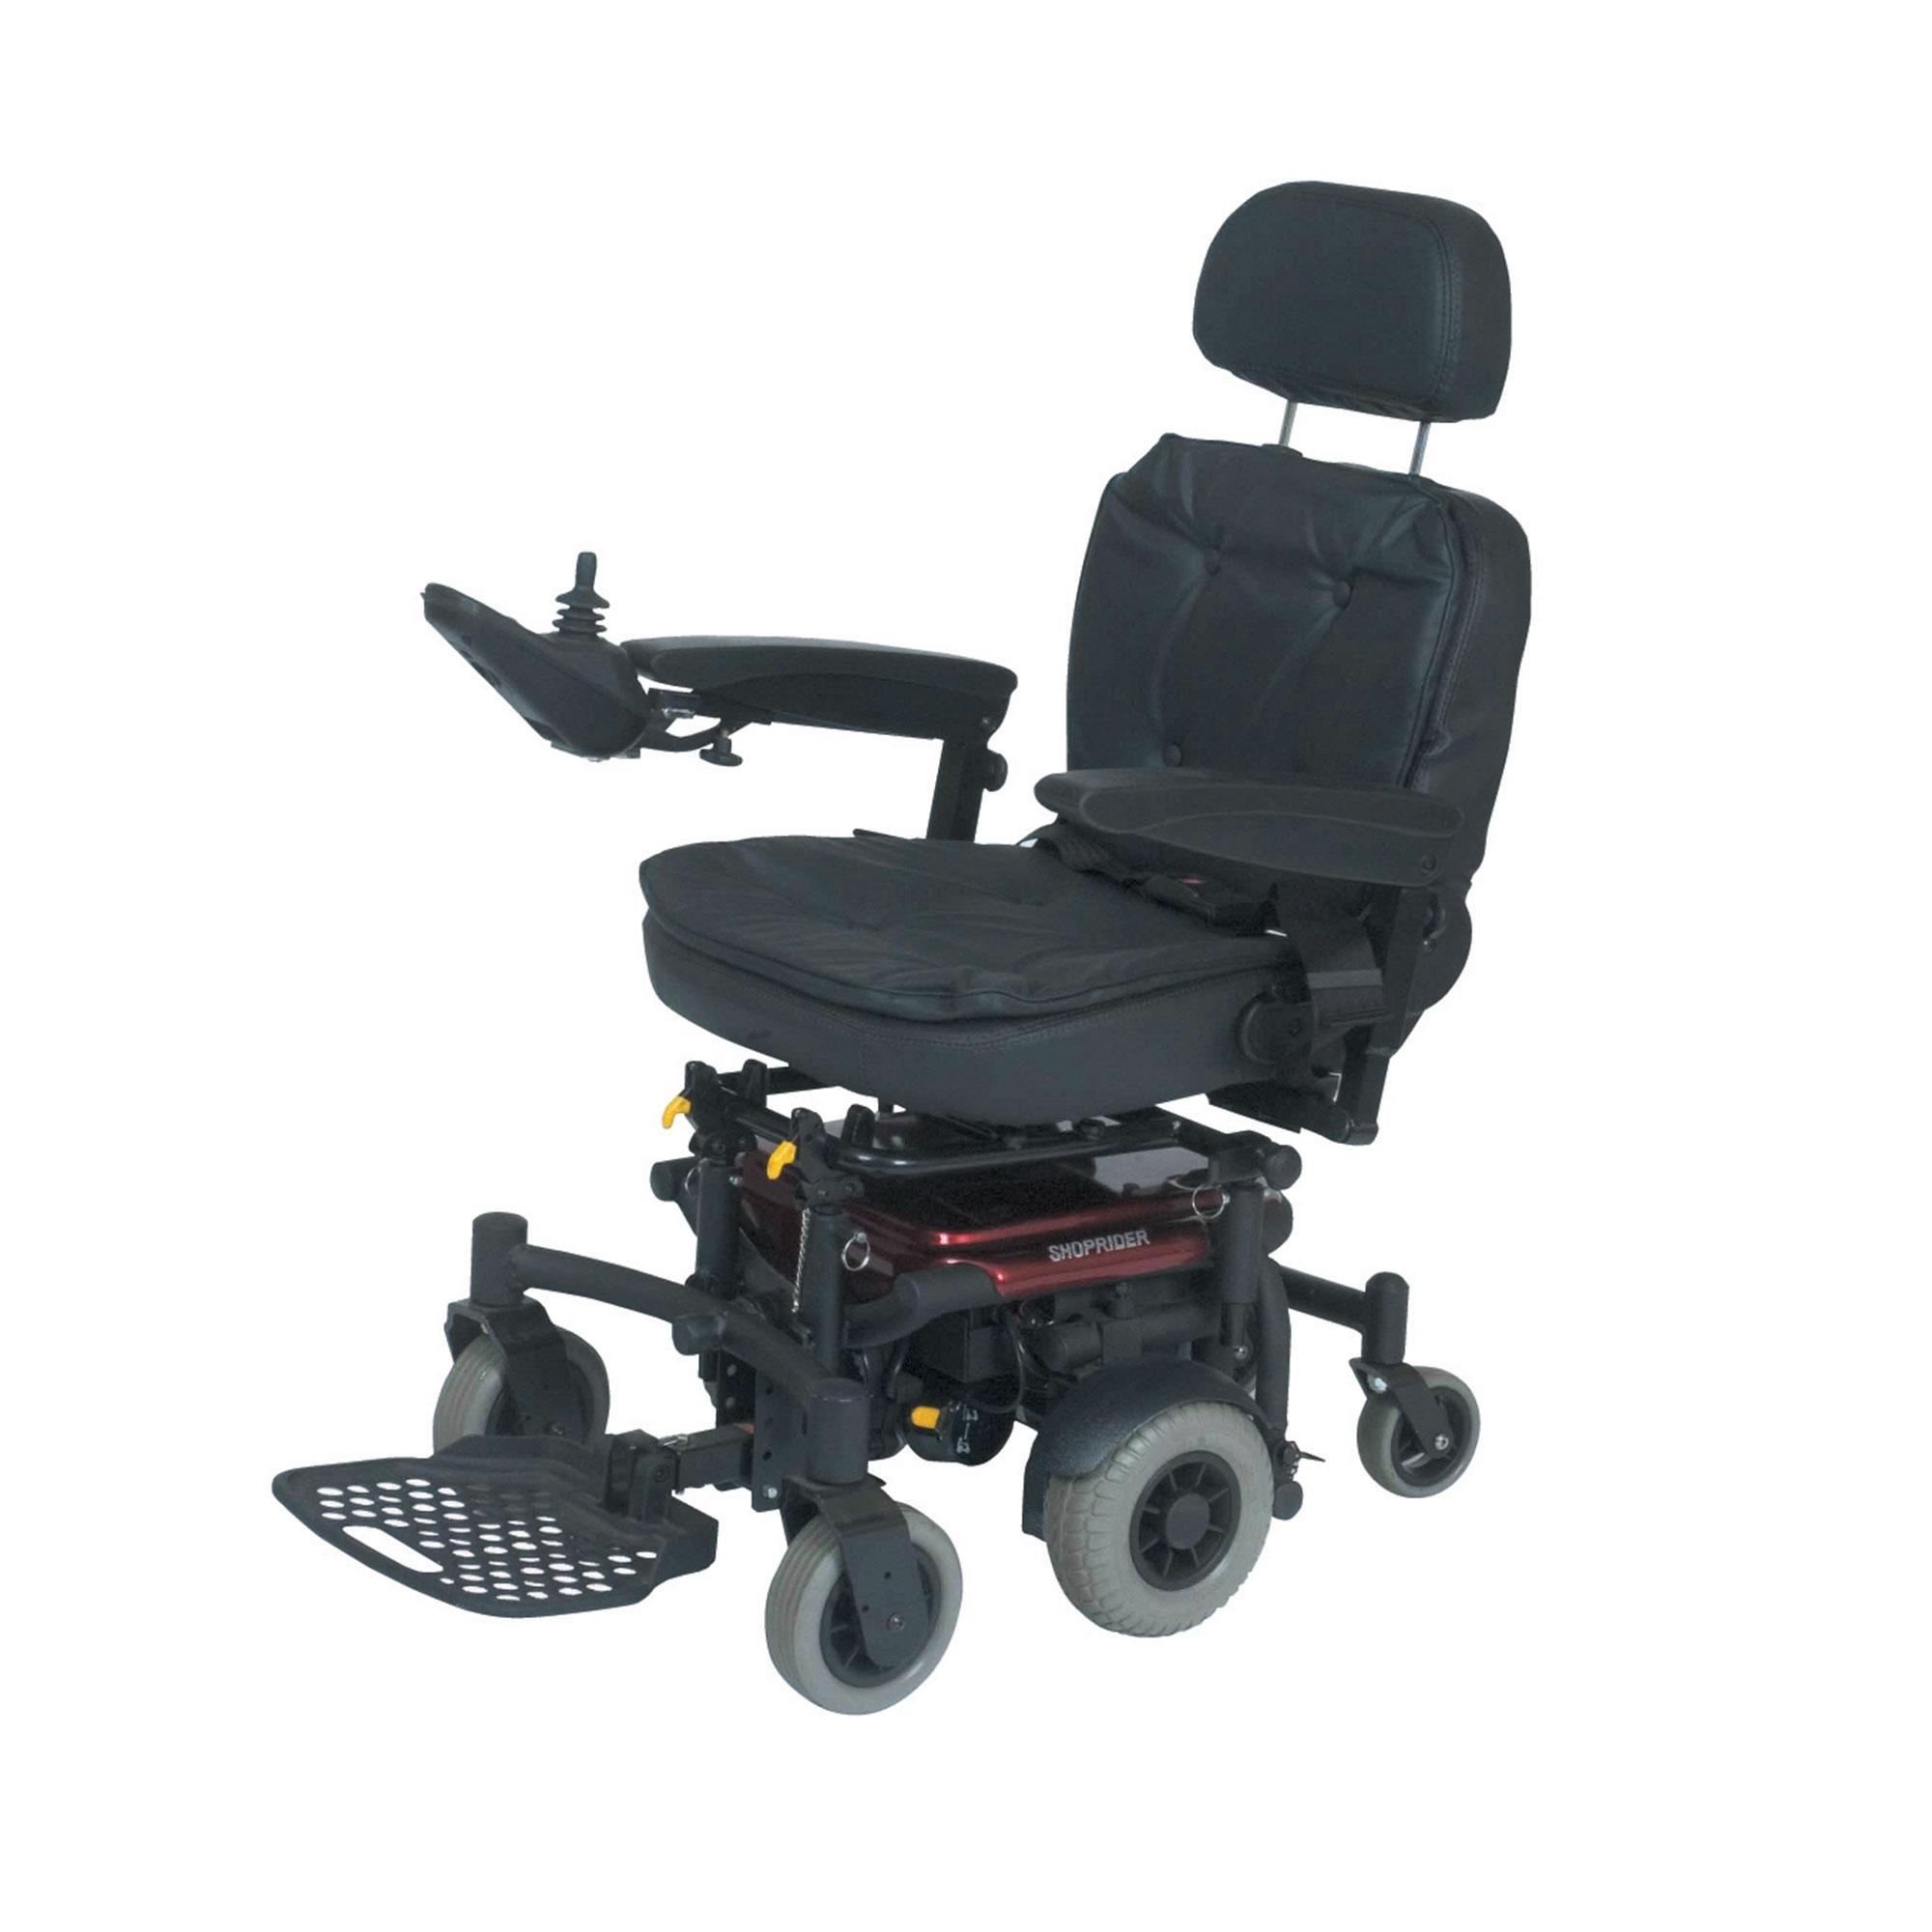 Shoprider Sena Power Chair Roma Medical